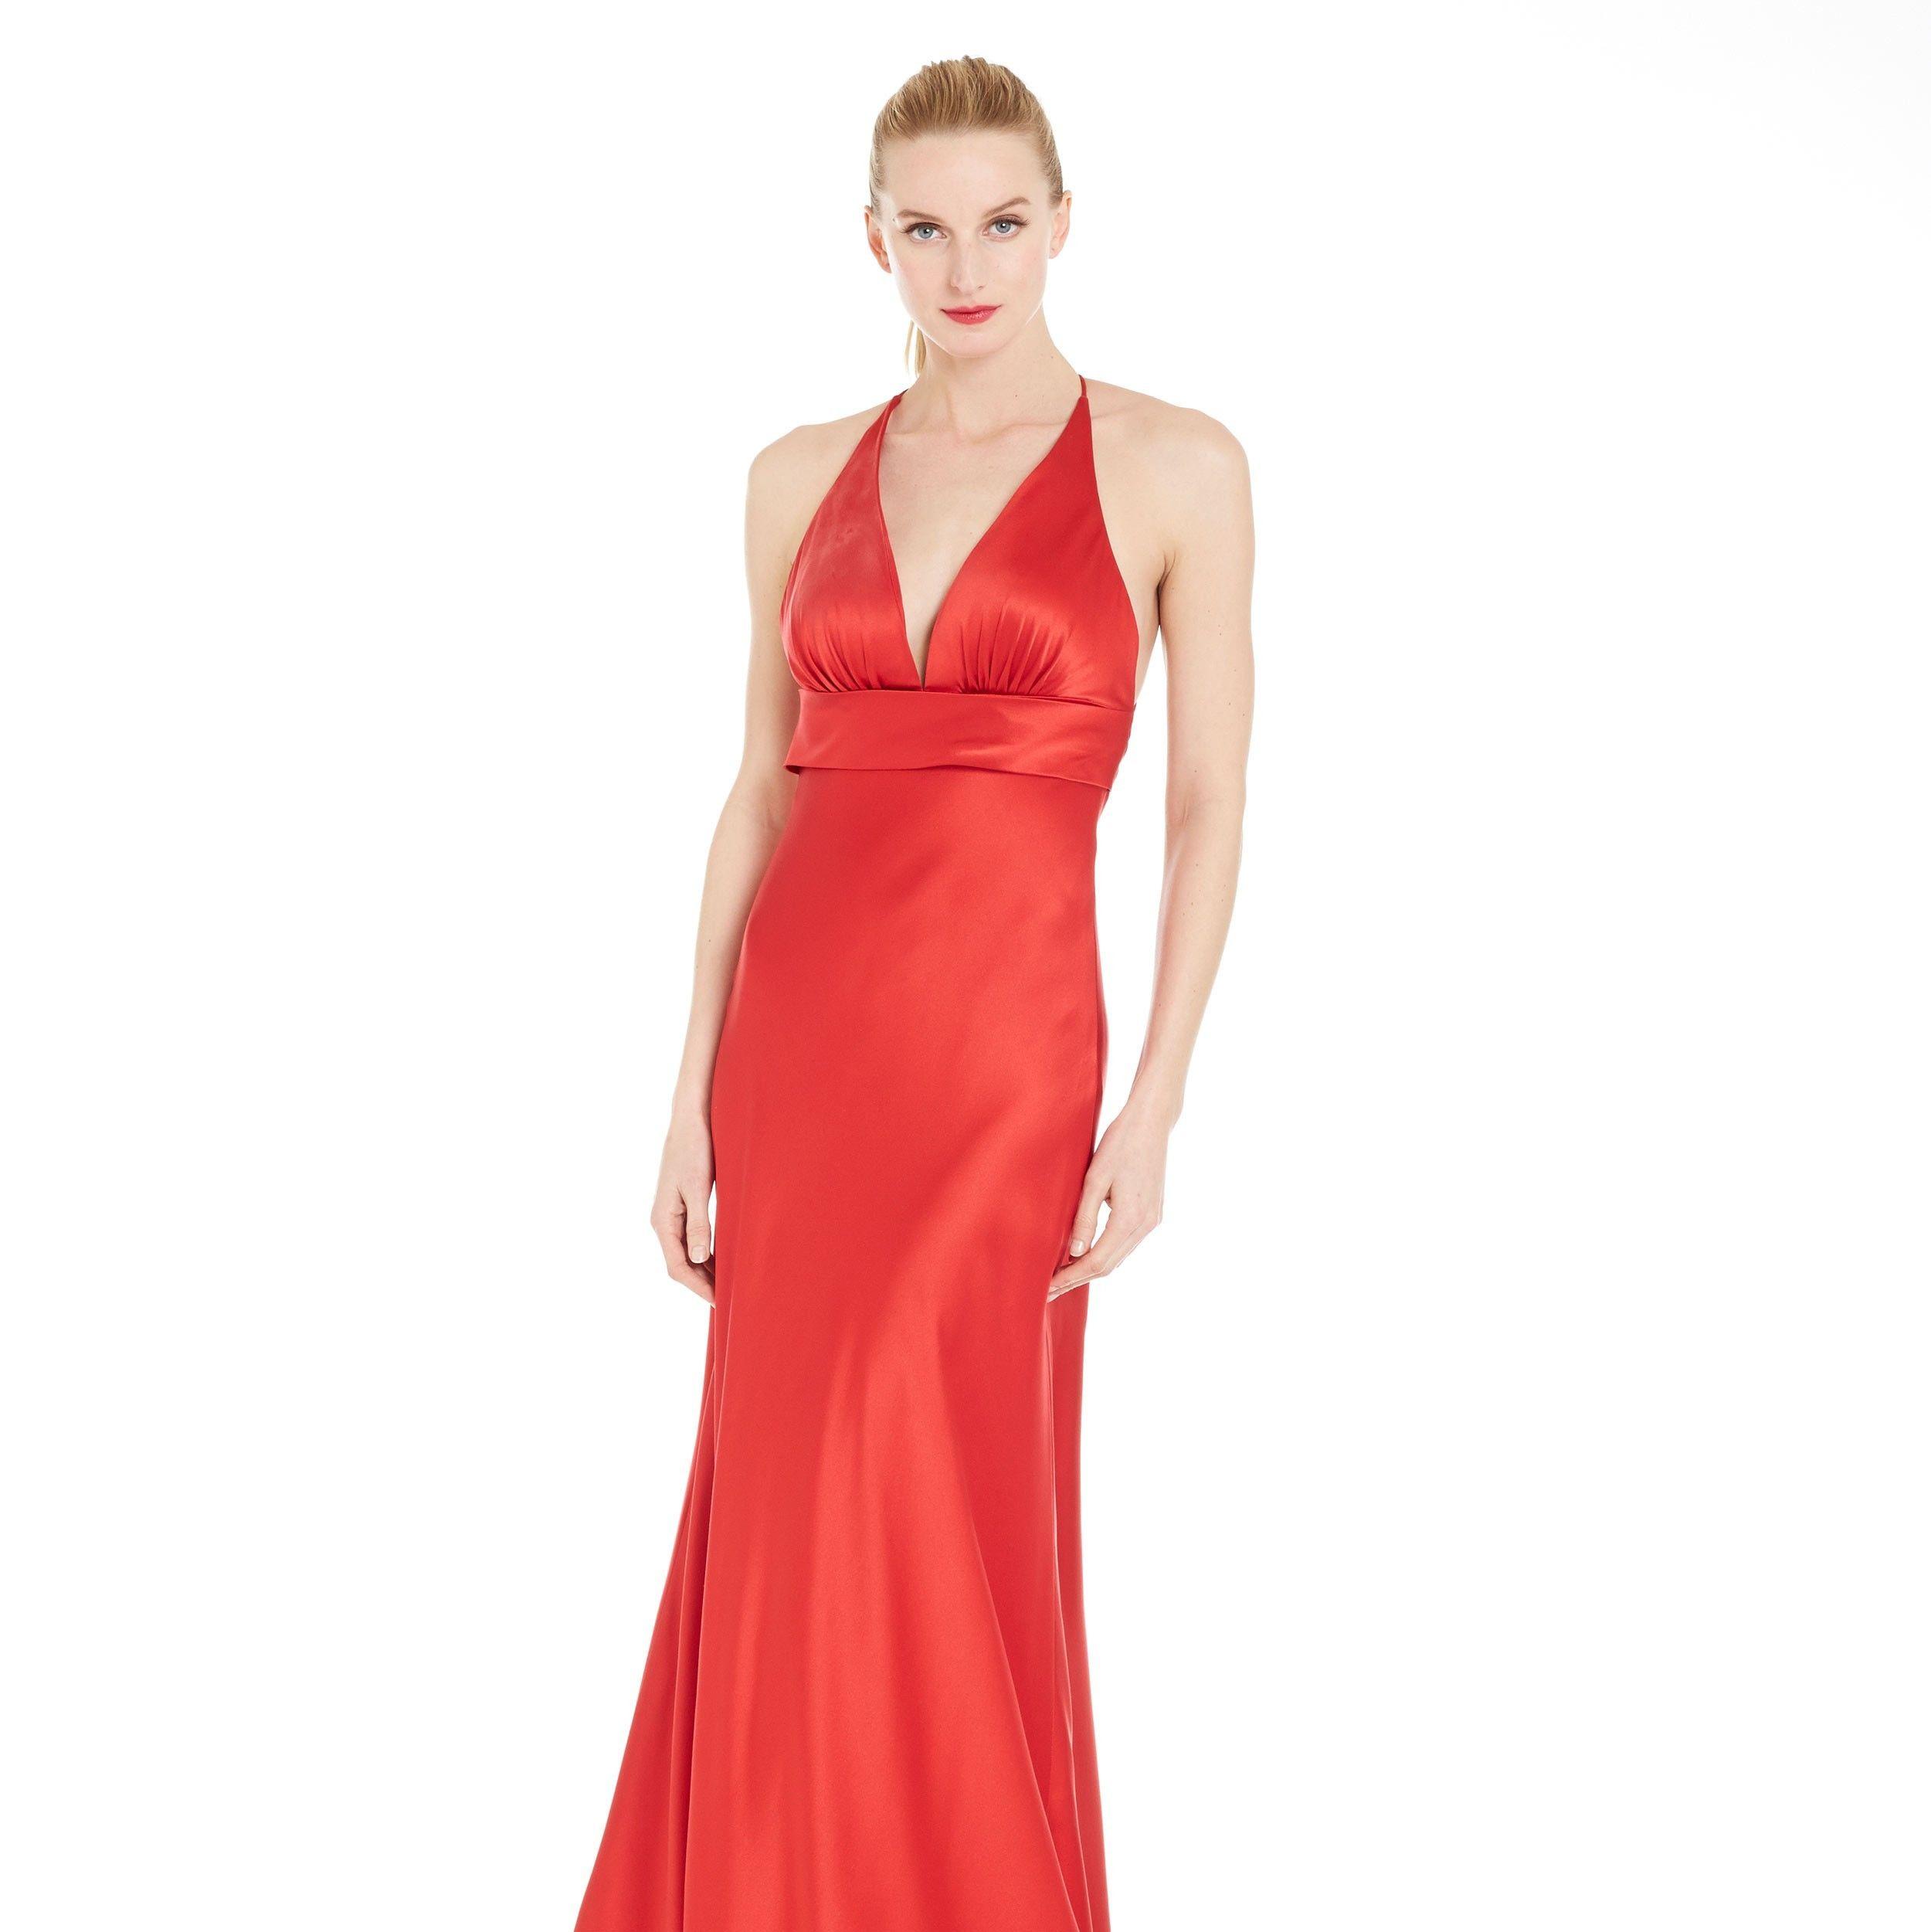 Lypl liquid luly yang ruby silk charmeuse spaghetti strap gown front 1 apjakb